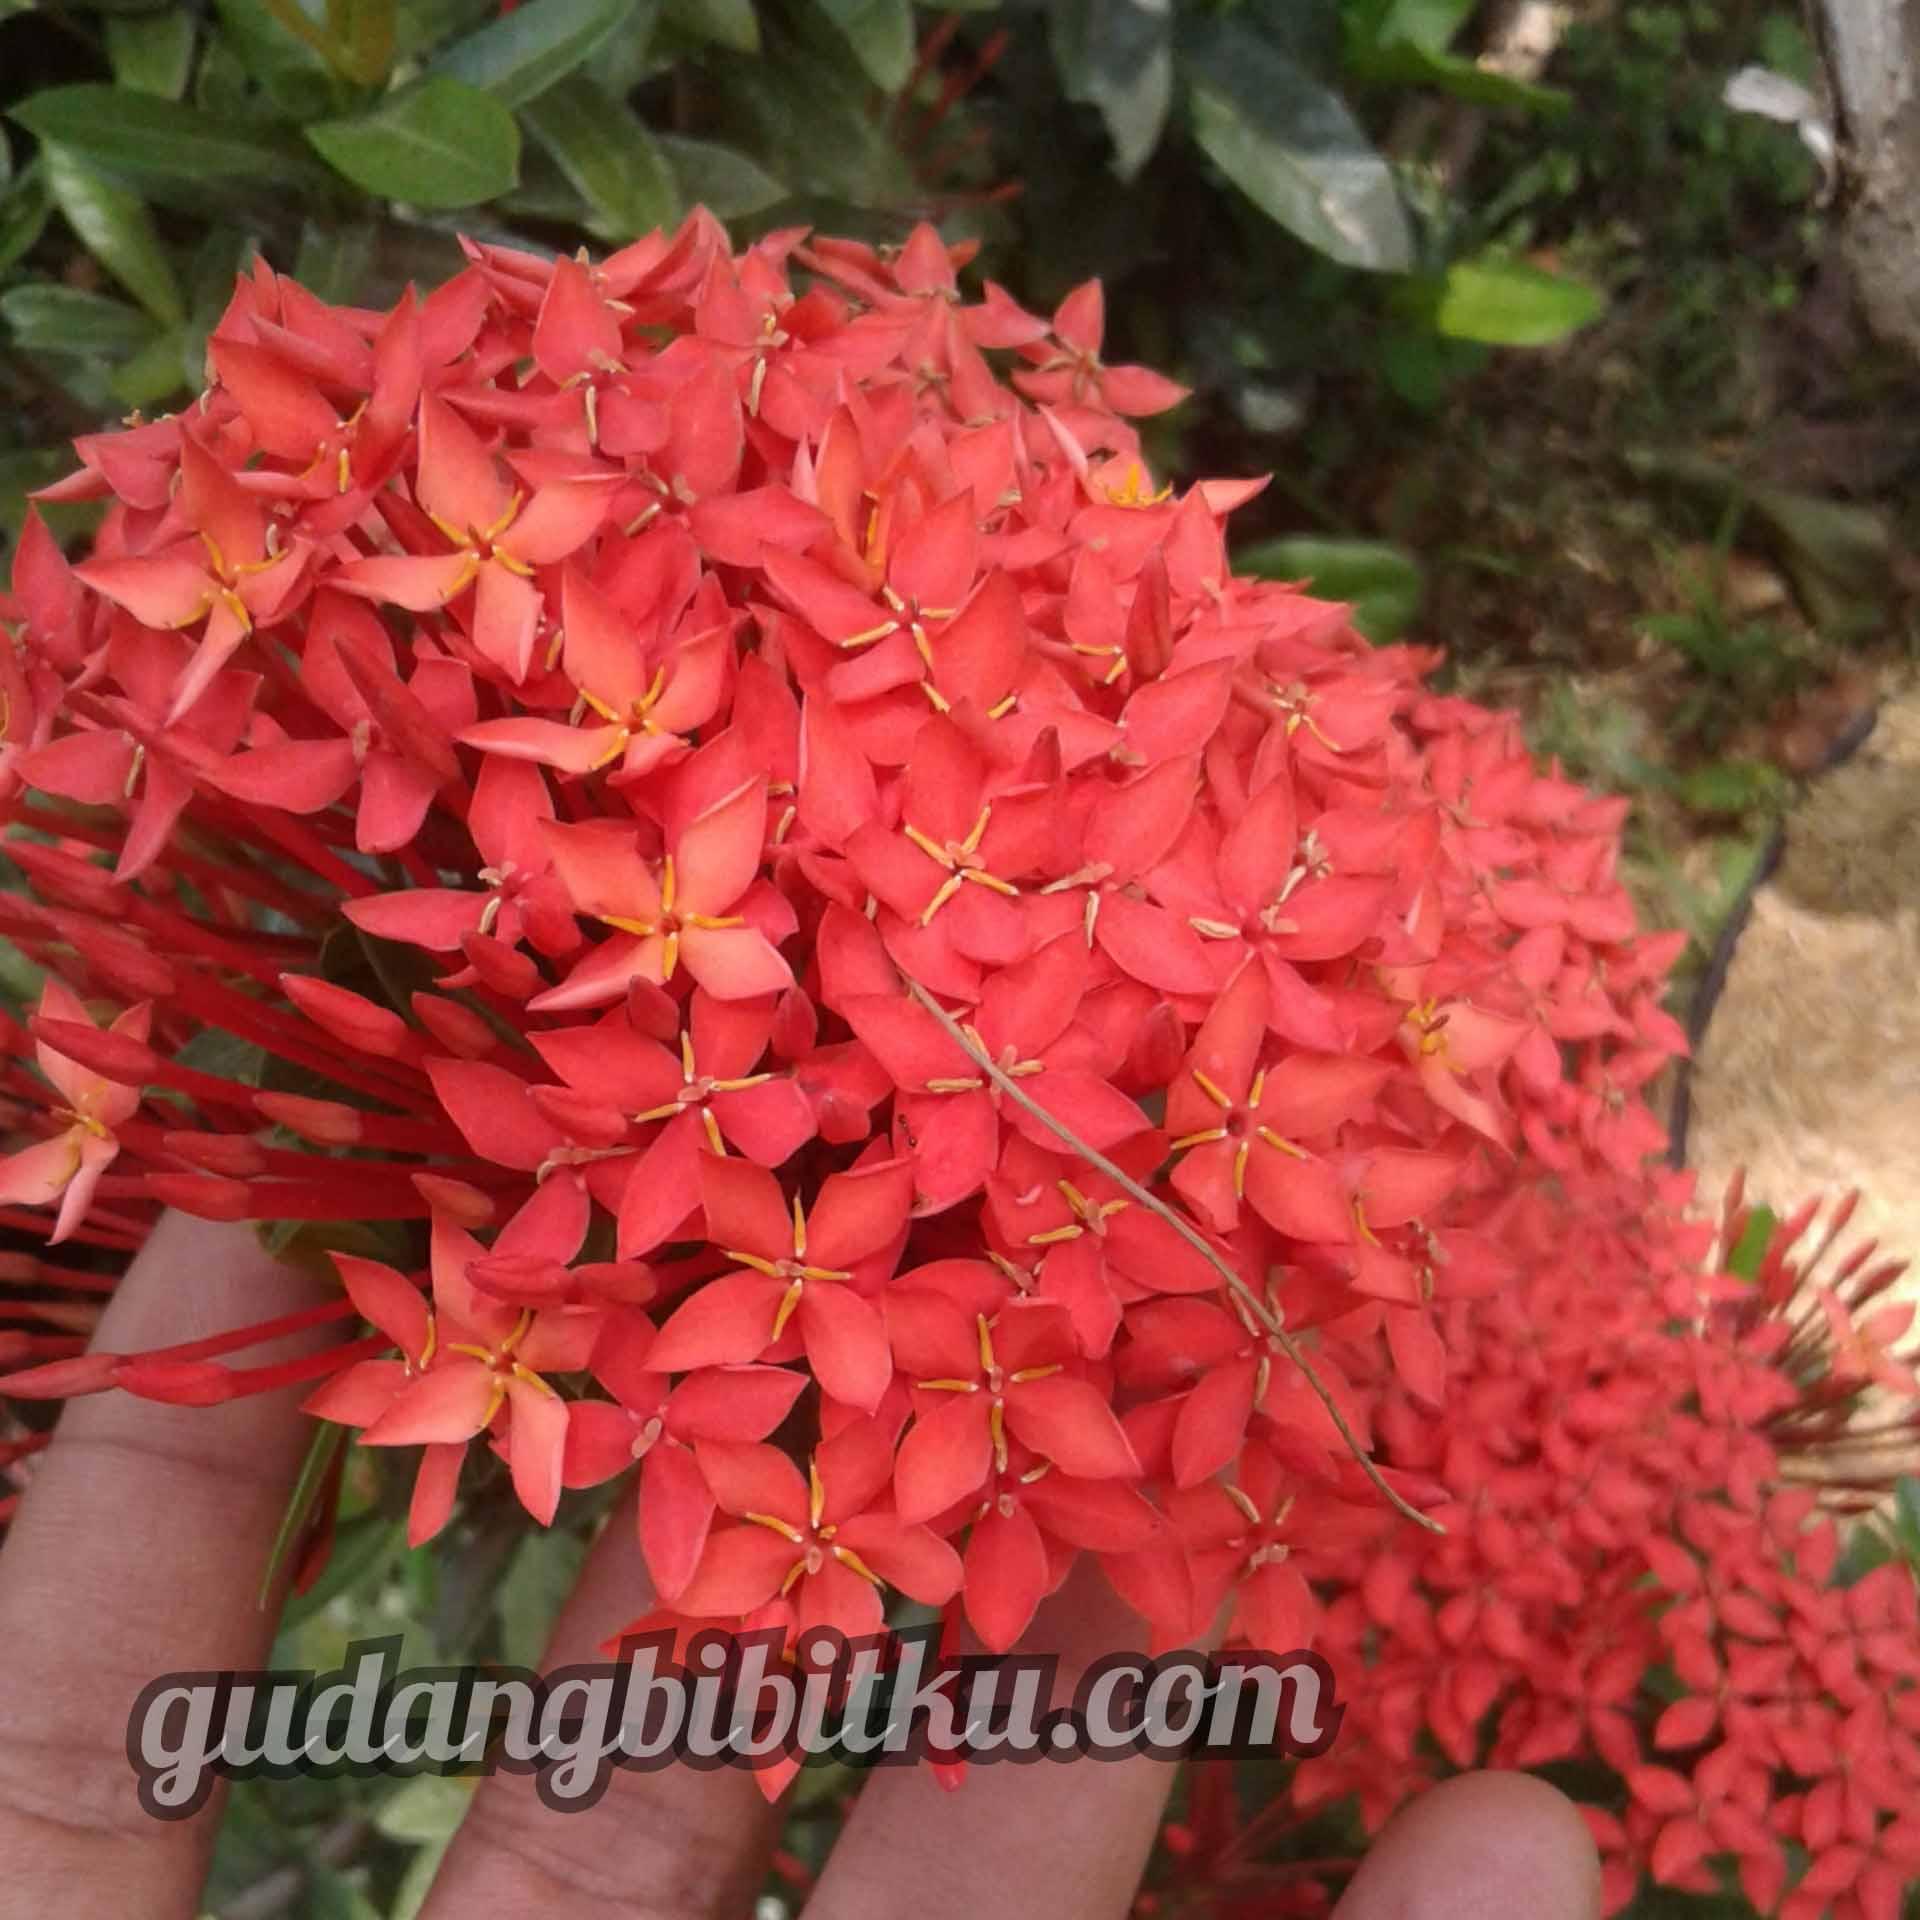 contoh gambar bunga asoka merah